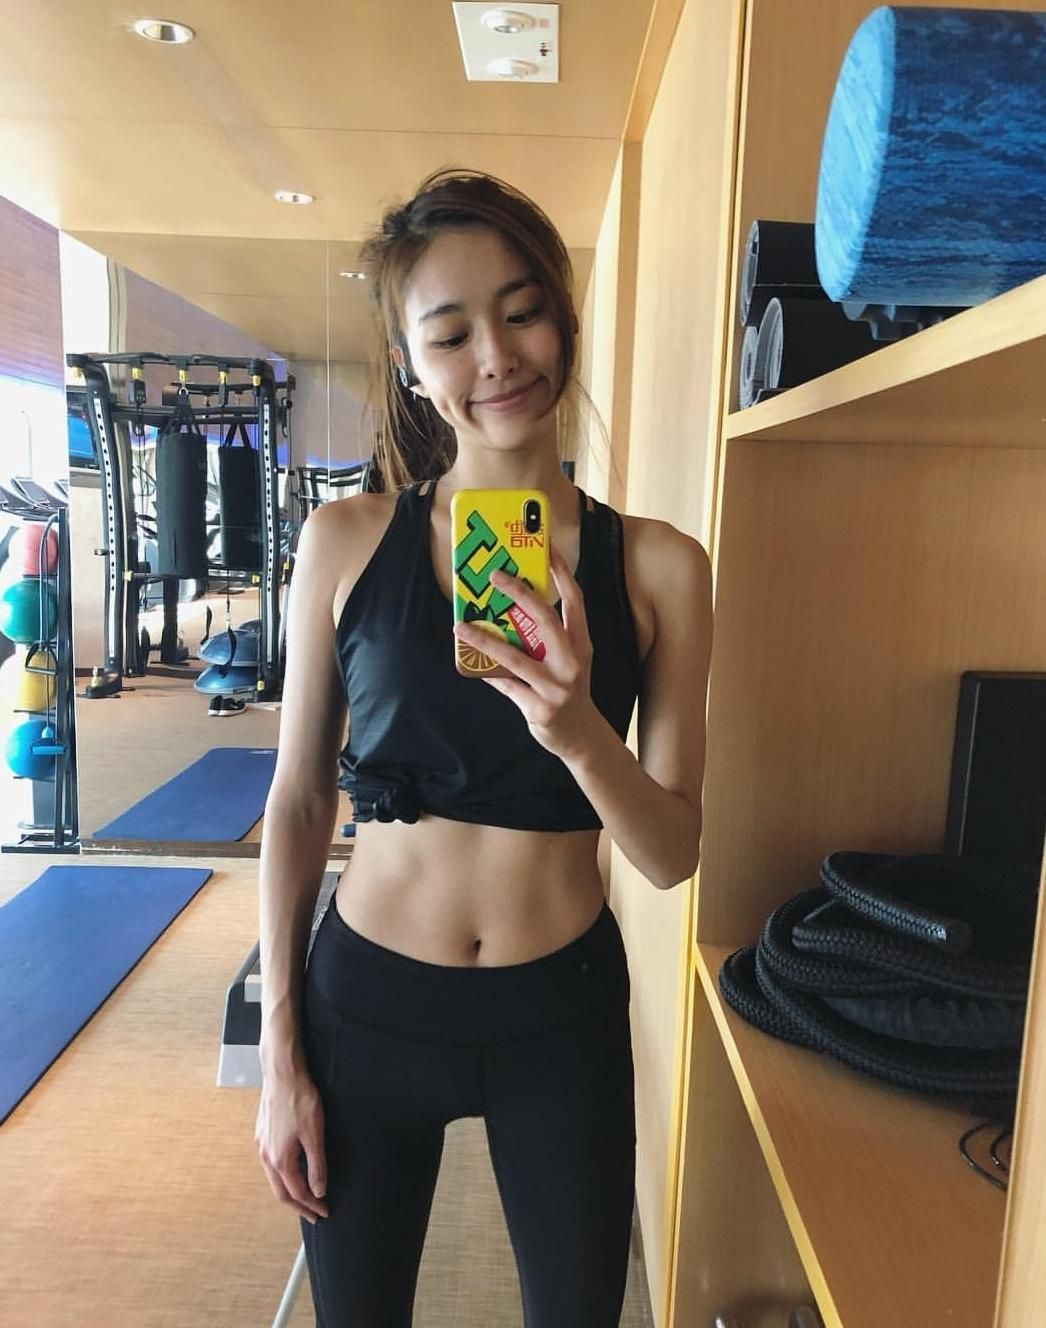 Pin by Rainman on Asian | Sports bra, Fashion, Cute